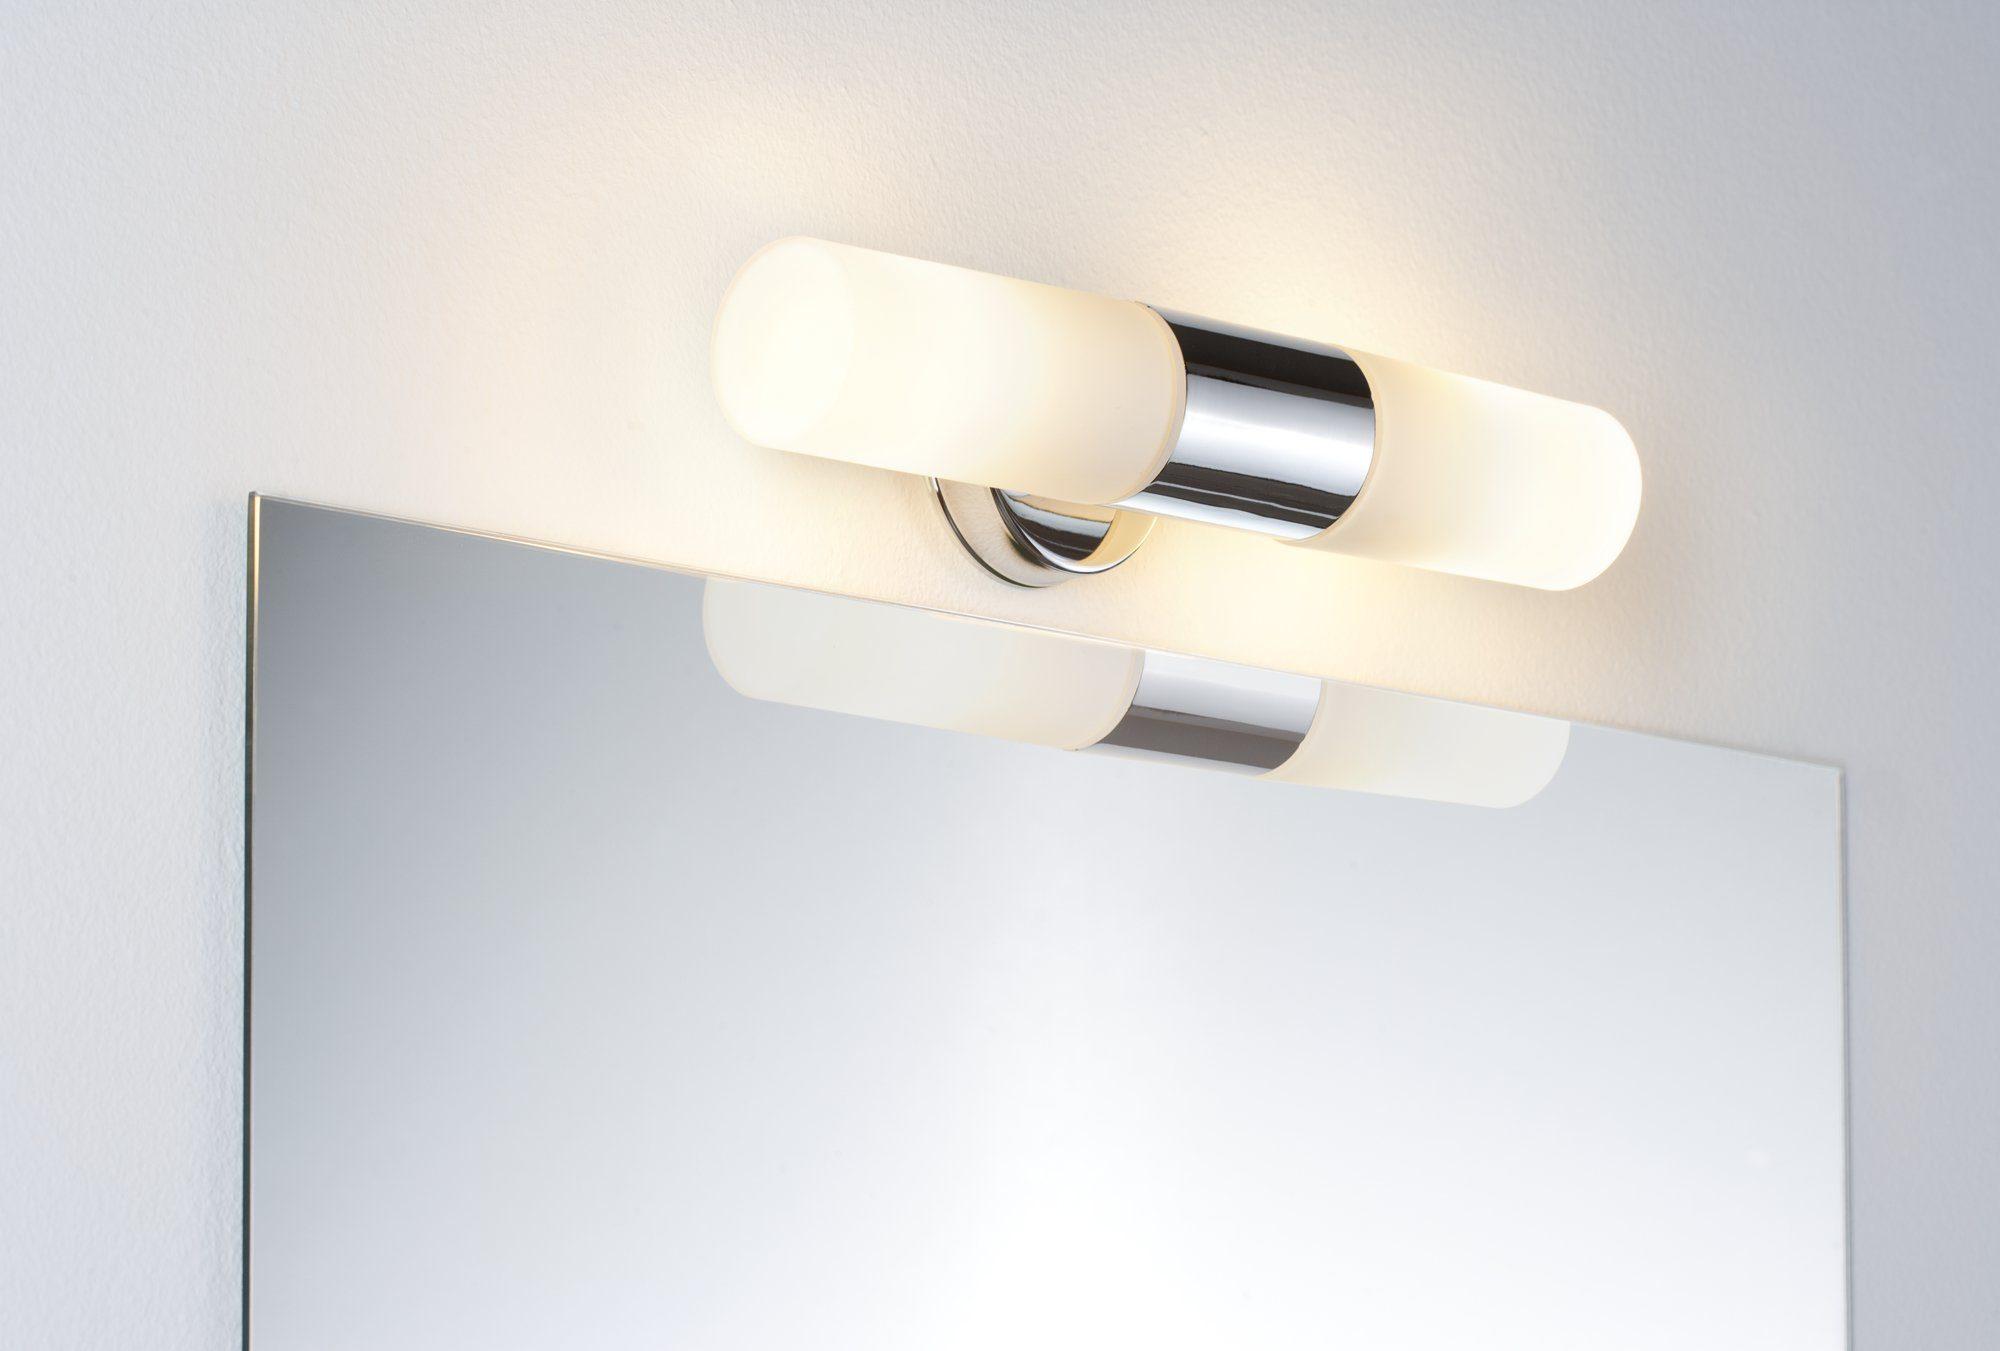 Paulmann LED Wandleuchte Spiegelleuchte Lenia max. 2x20W Chrom Opak Metall Glas E14, E14, 1 St.